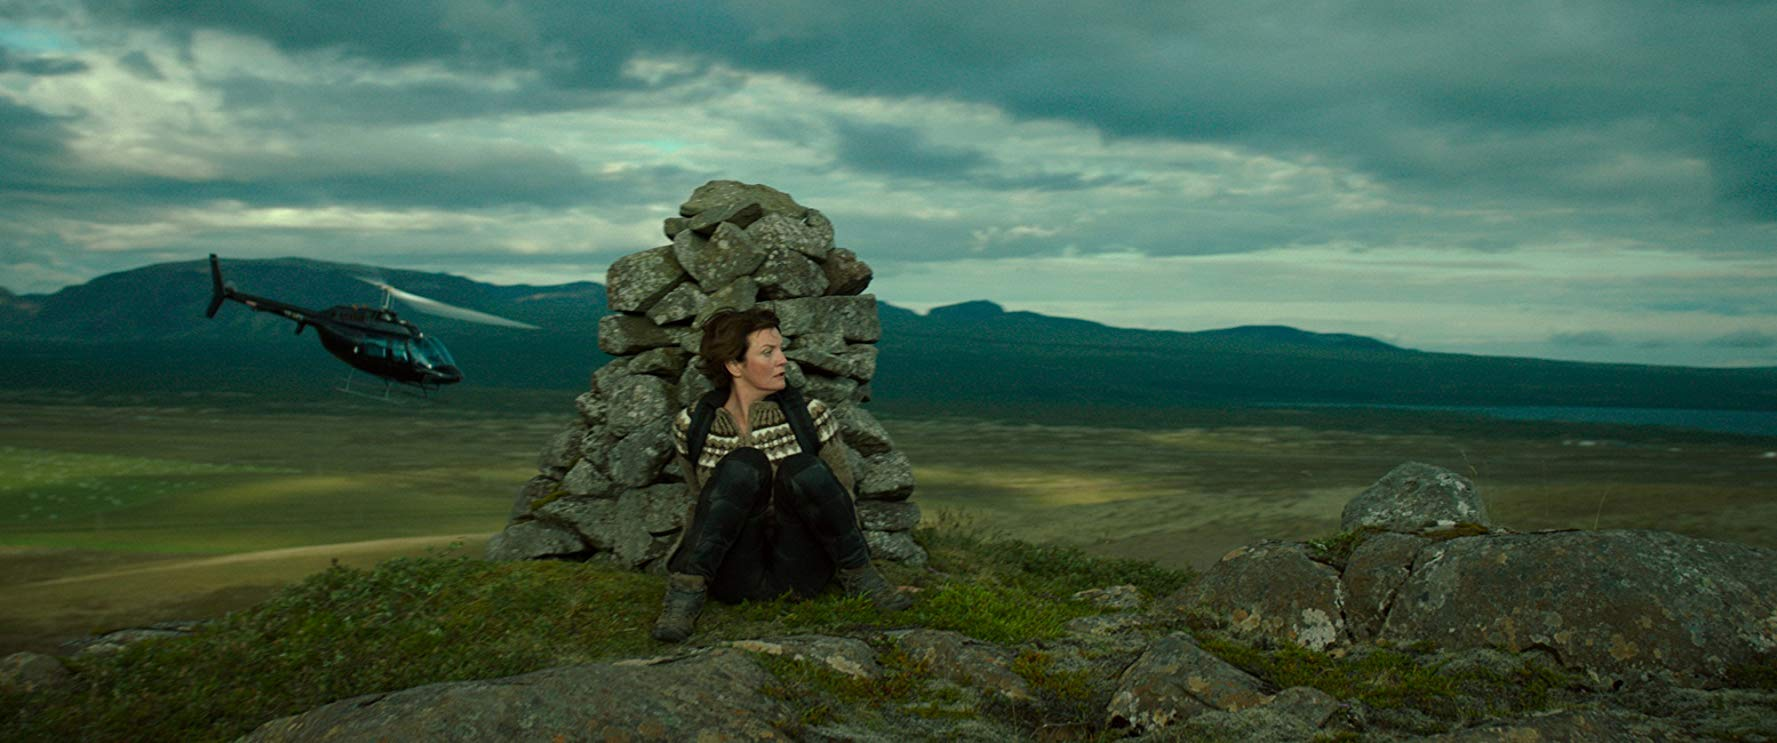 La donna elettrica: Halldóra Geirharðsdóttir in una scena